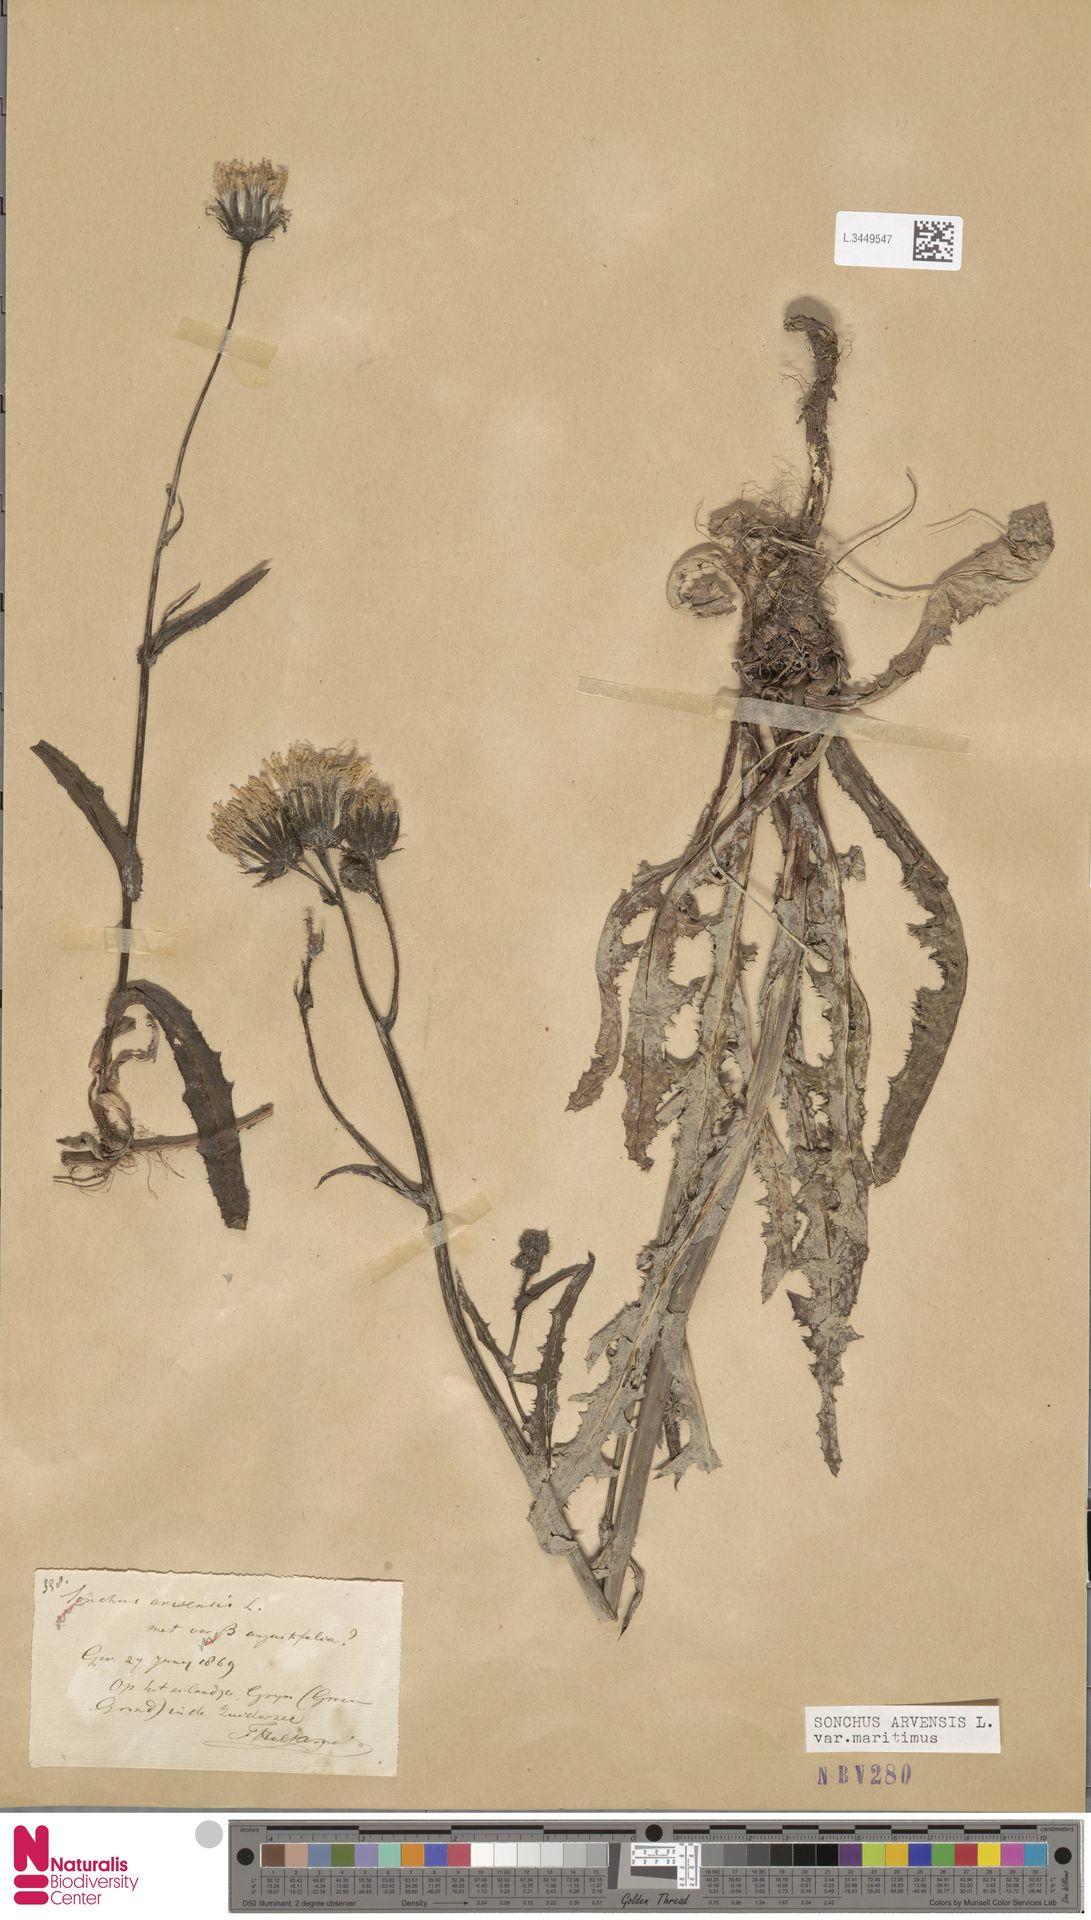 L.3449547 | Sonchus arvensis var. maritimus G.Mey.